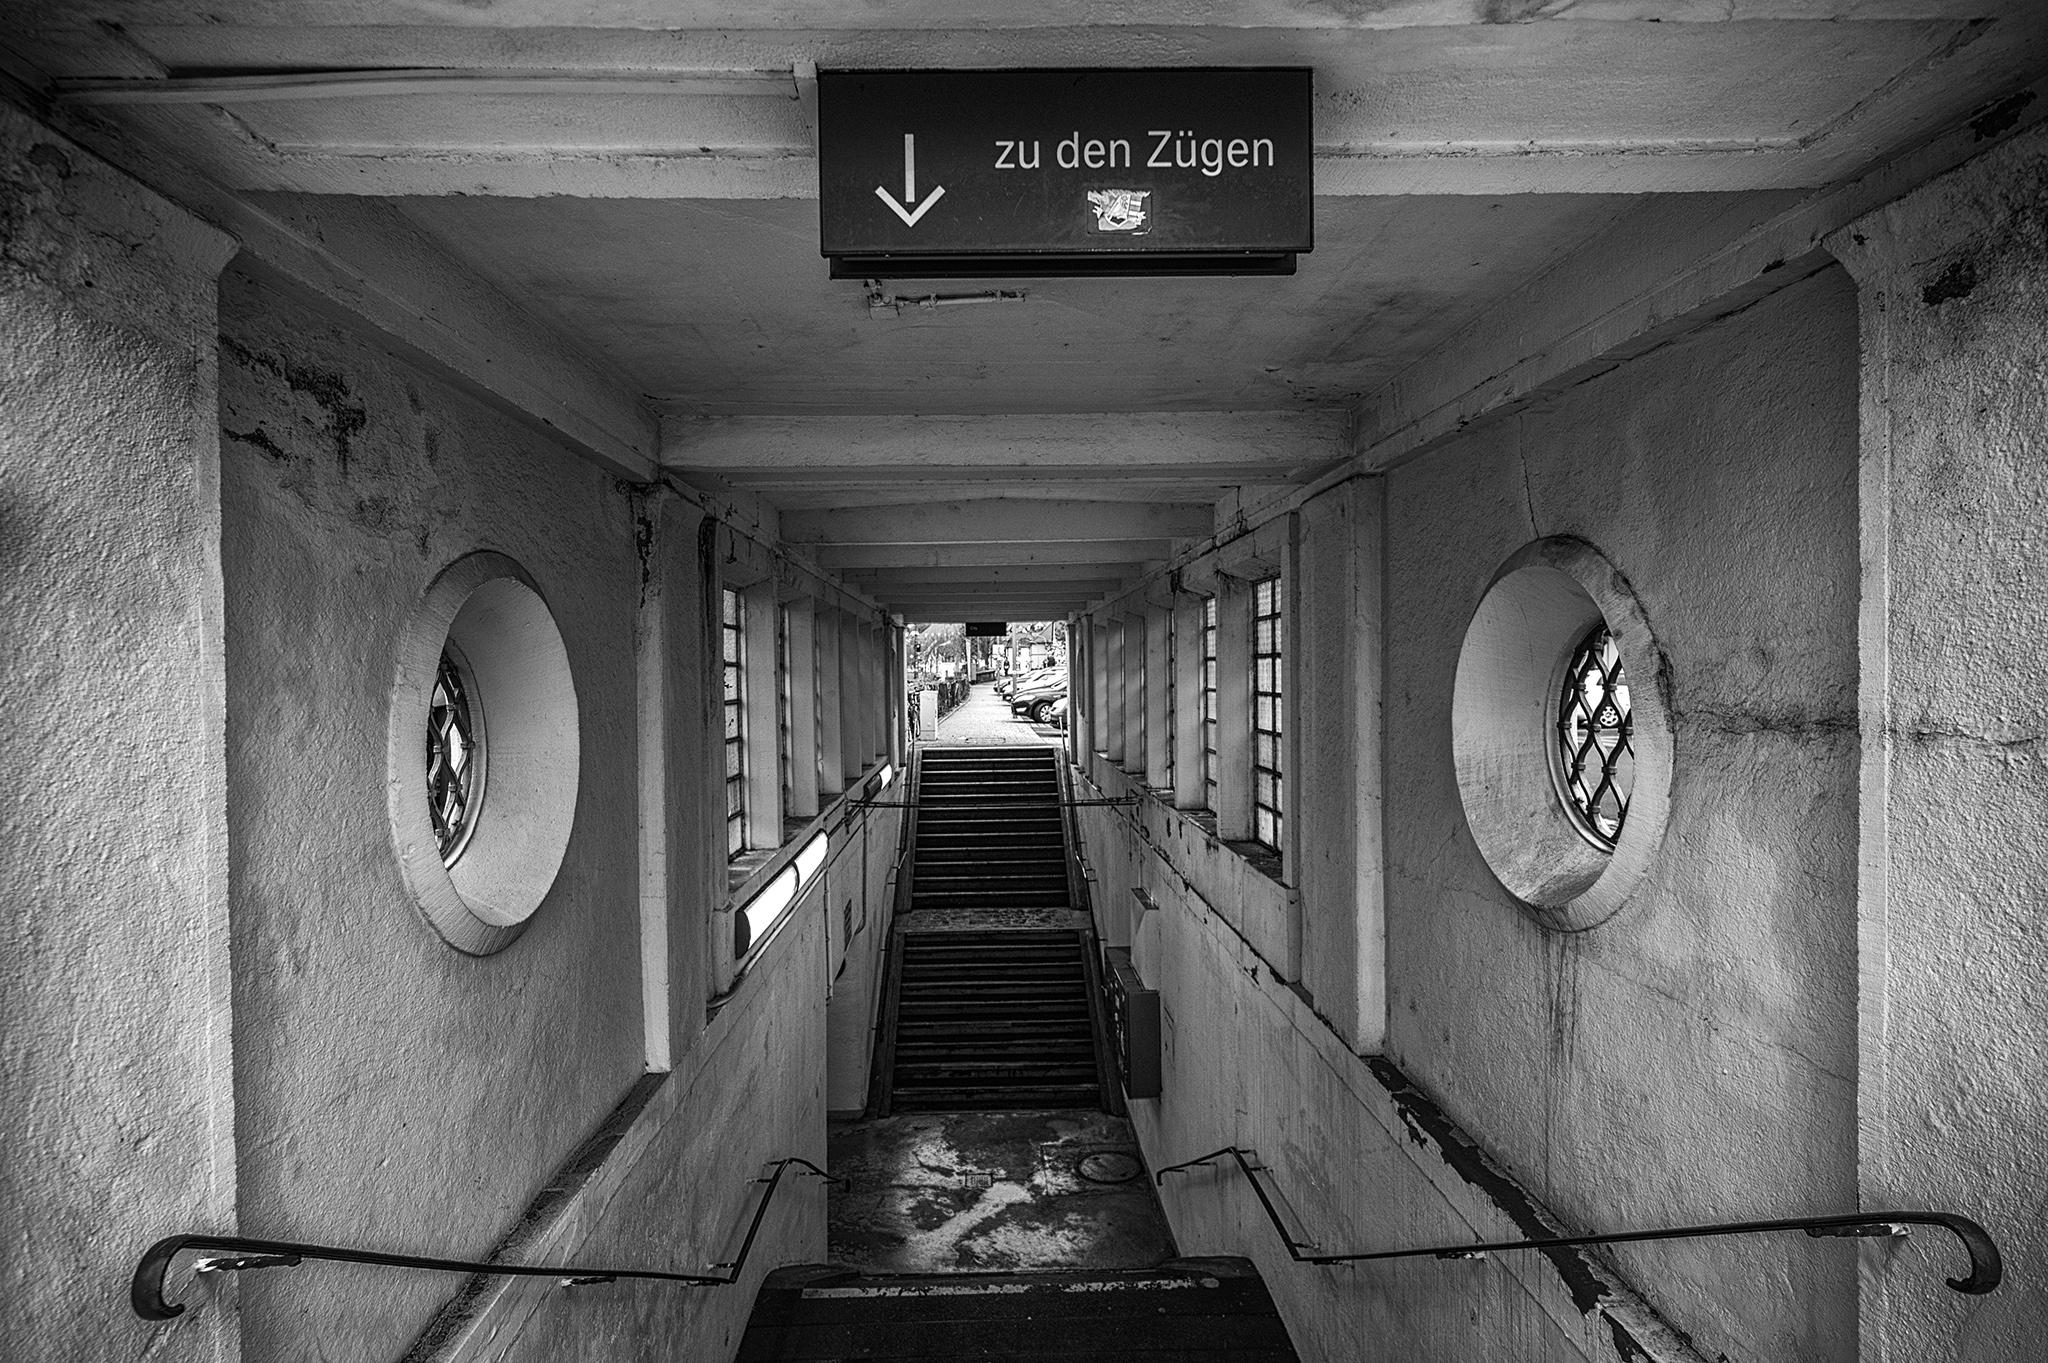 2016-02-21-Bahn-L1004450 by Roger Schäfer.